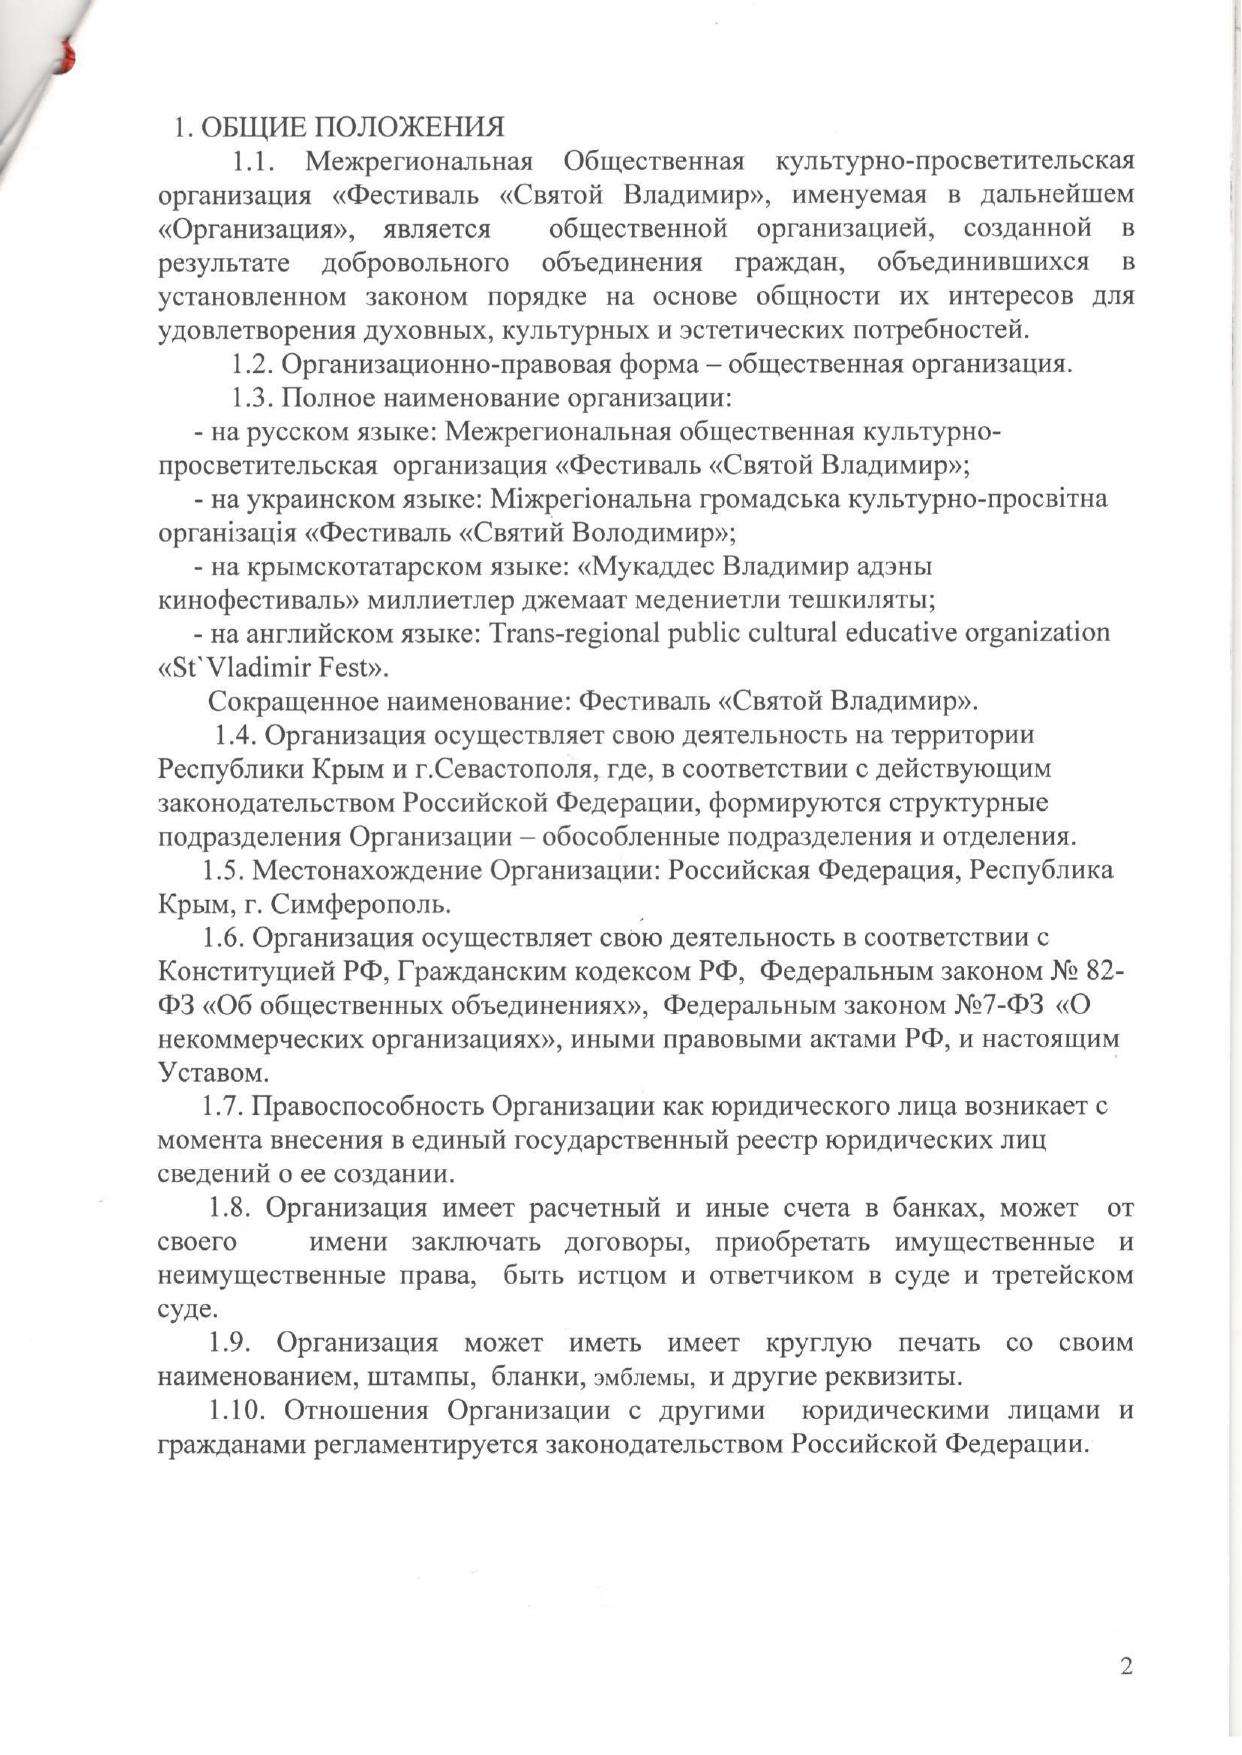 Устав_pages-to-jpg-0002